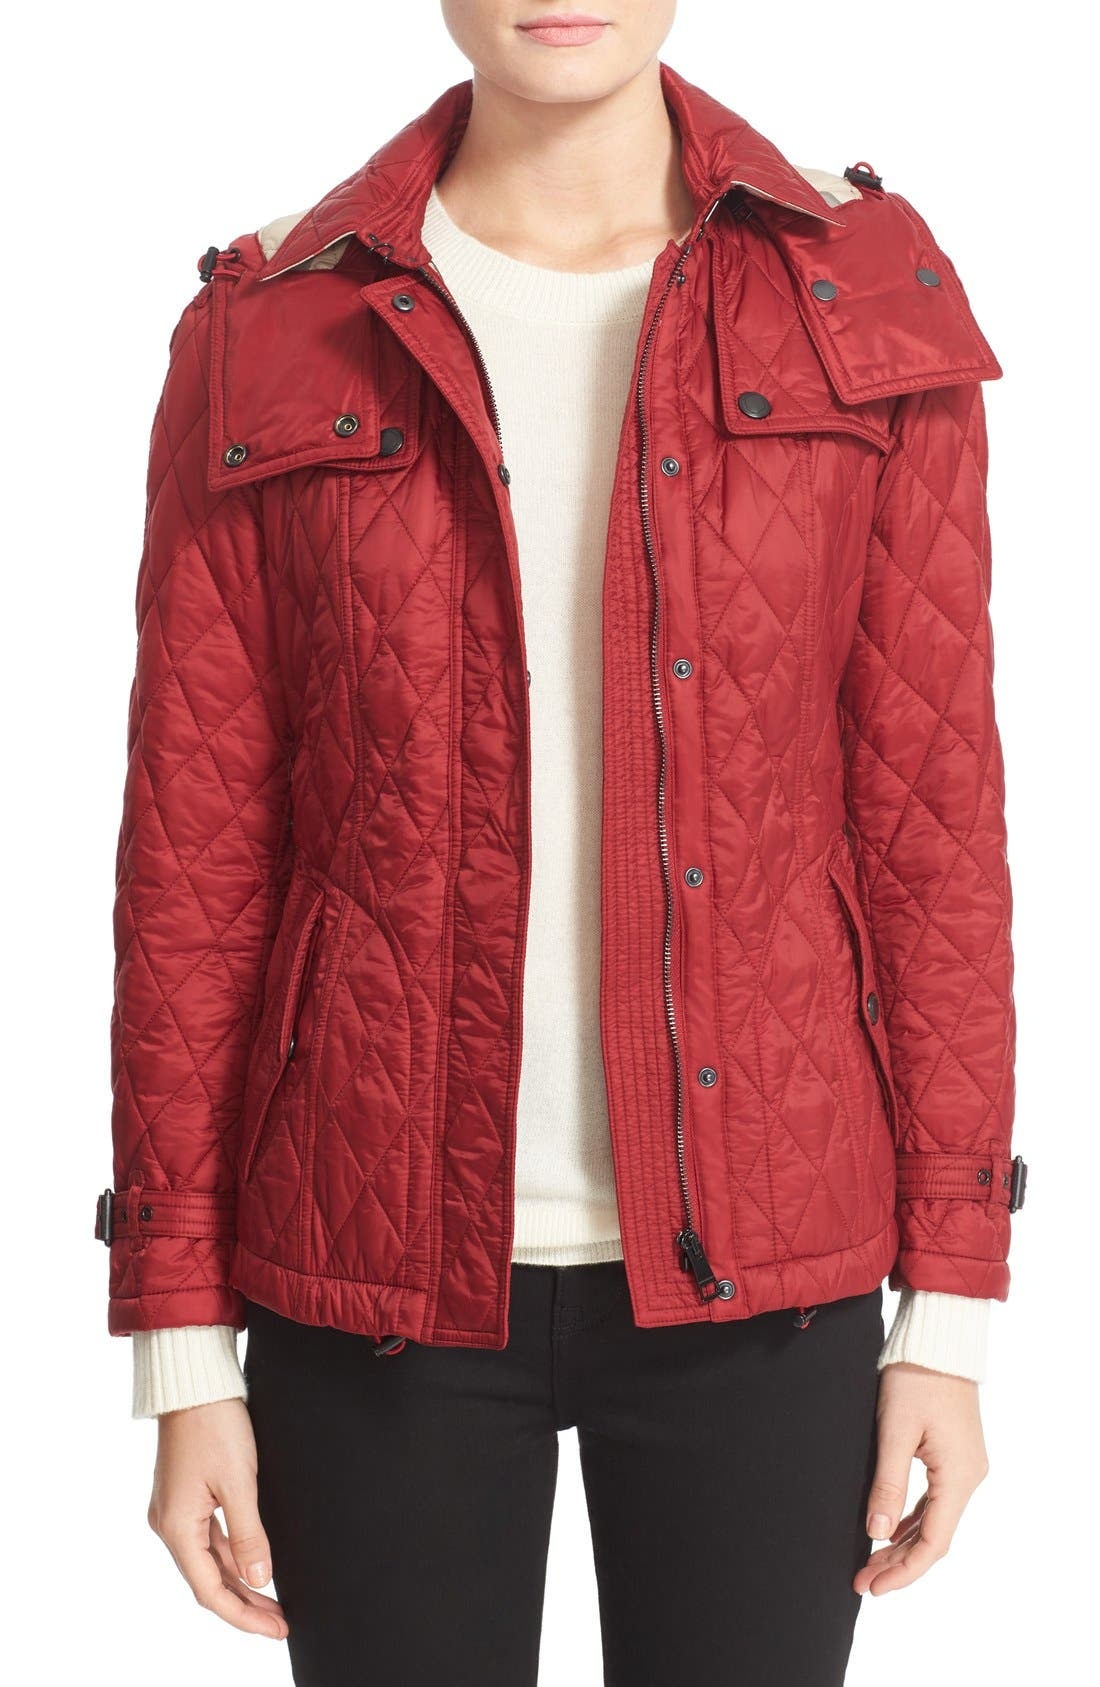 Alternate Image 1 Selected - Burberry Finsbridge ShortQuilted Jacket